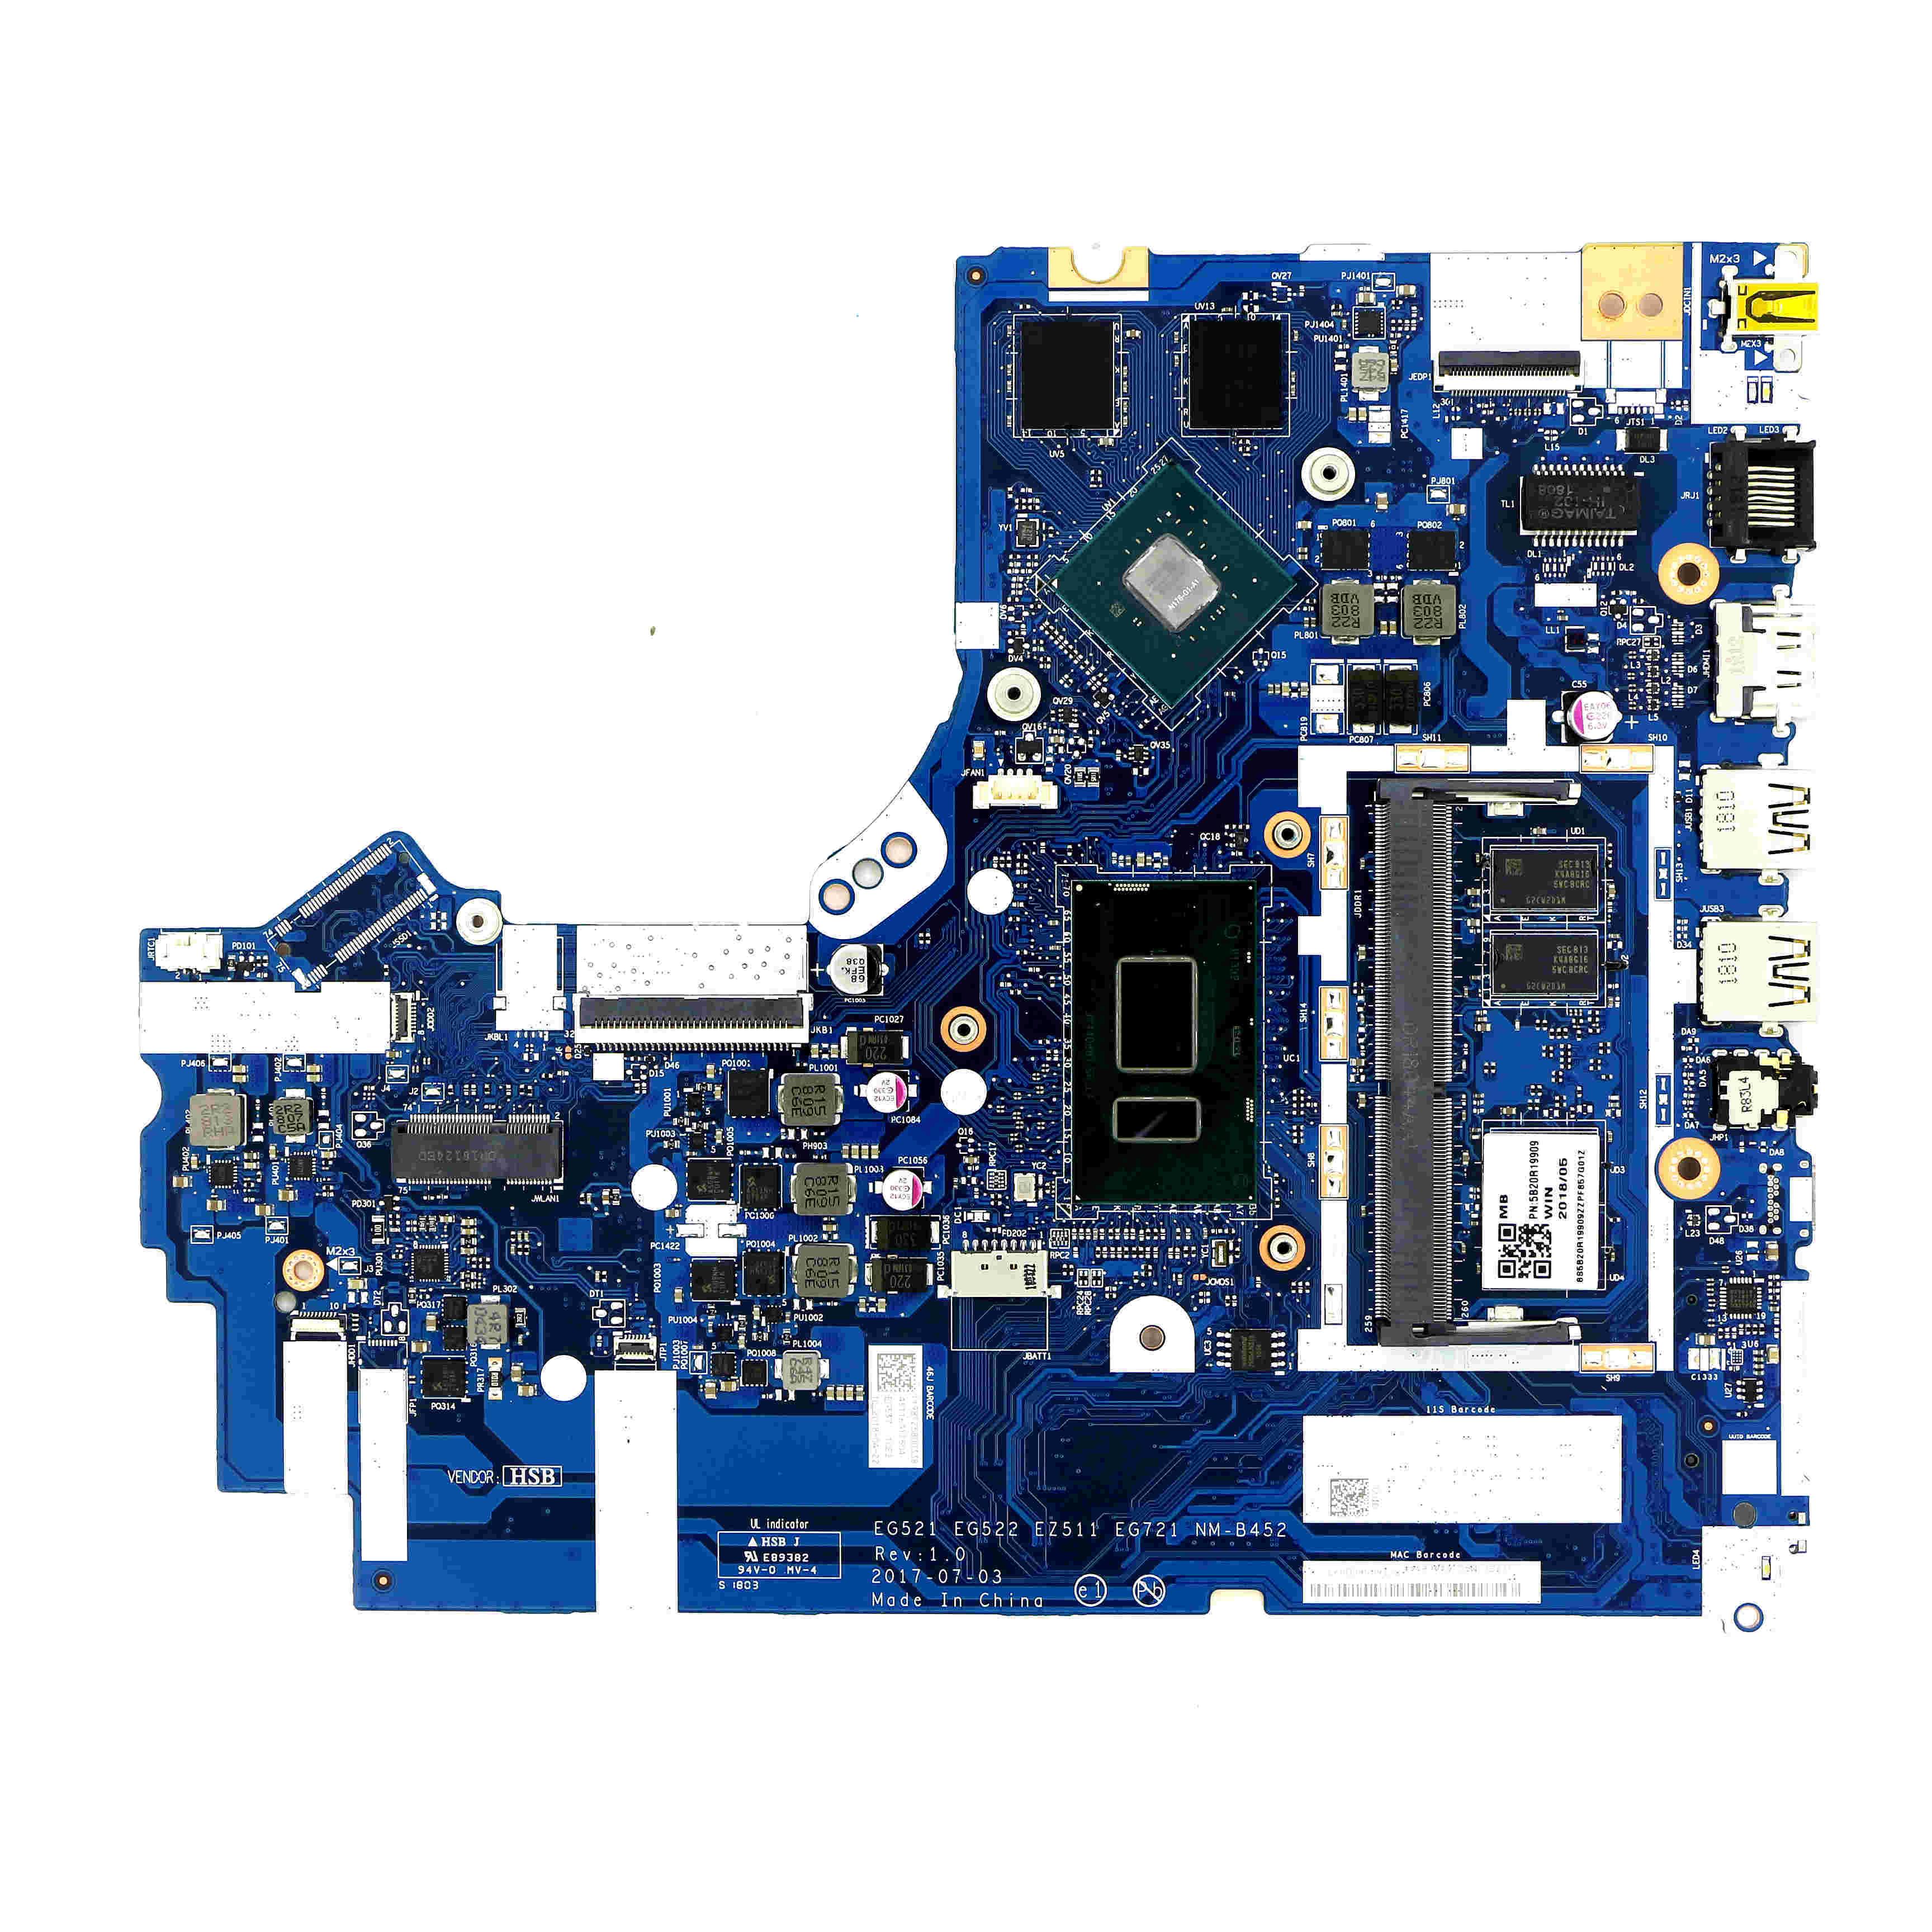 5B20R19909-discreta placa base NM-B452 w/ i5-8250U CPU + MX150 GPU para LENOVO IDEAPAD 330-15IKB